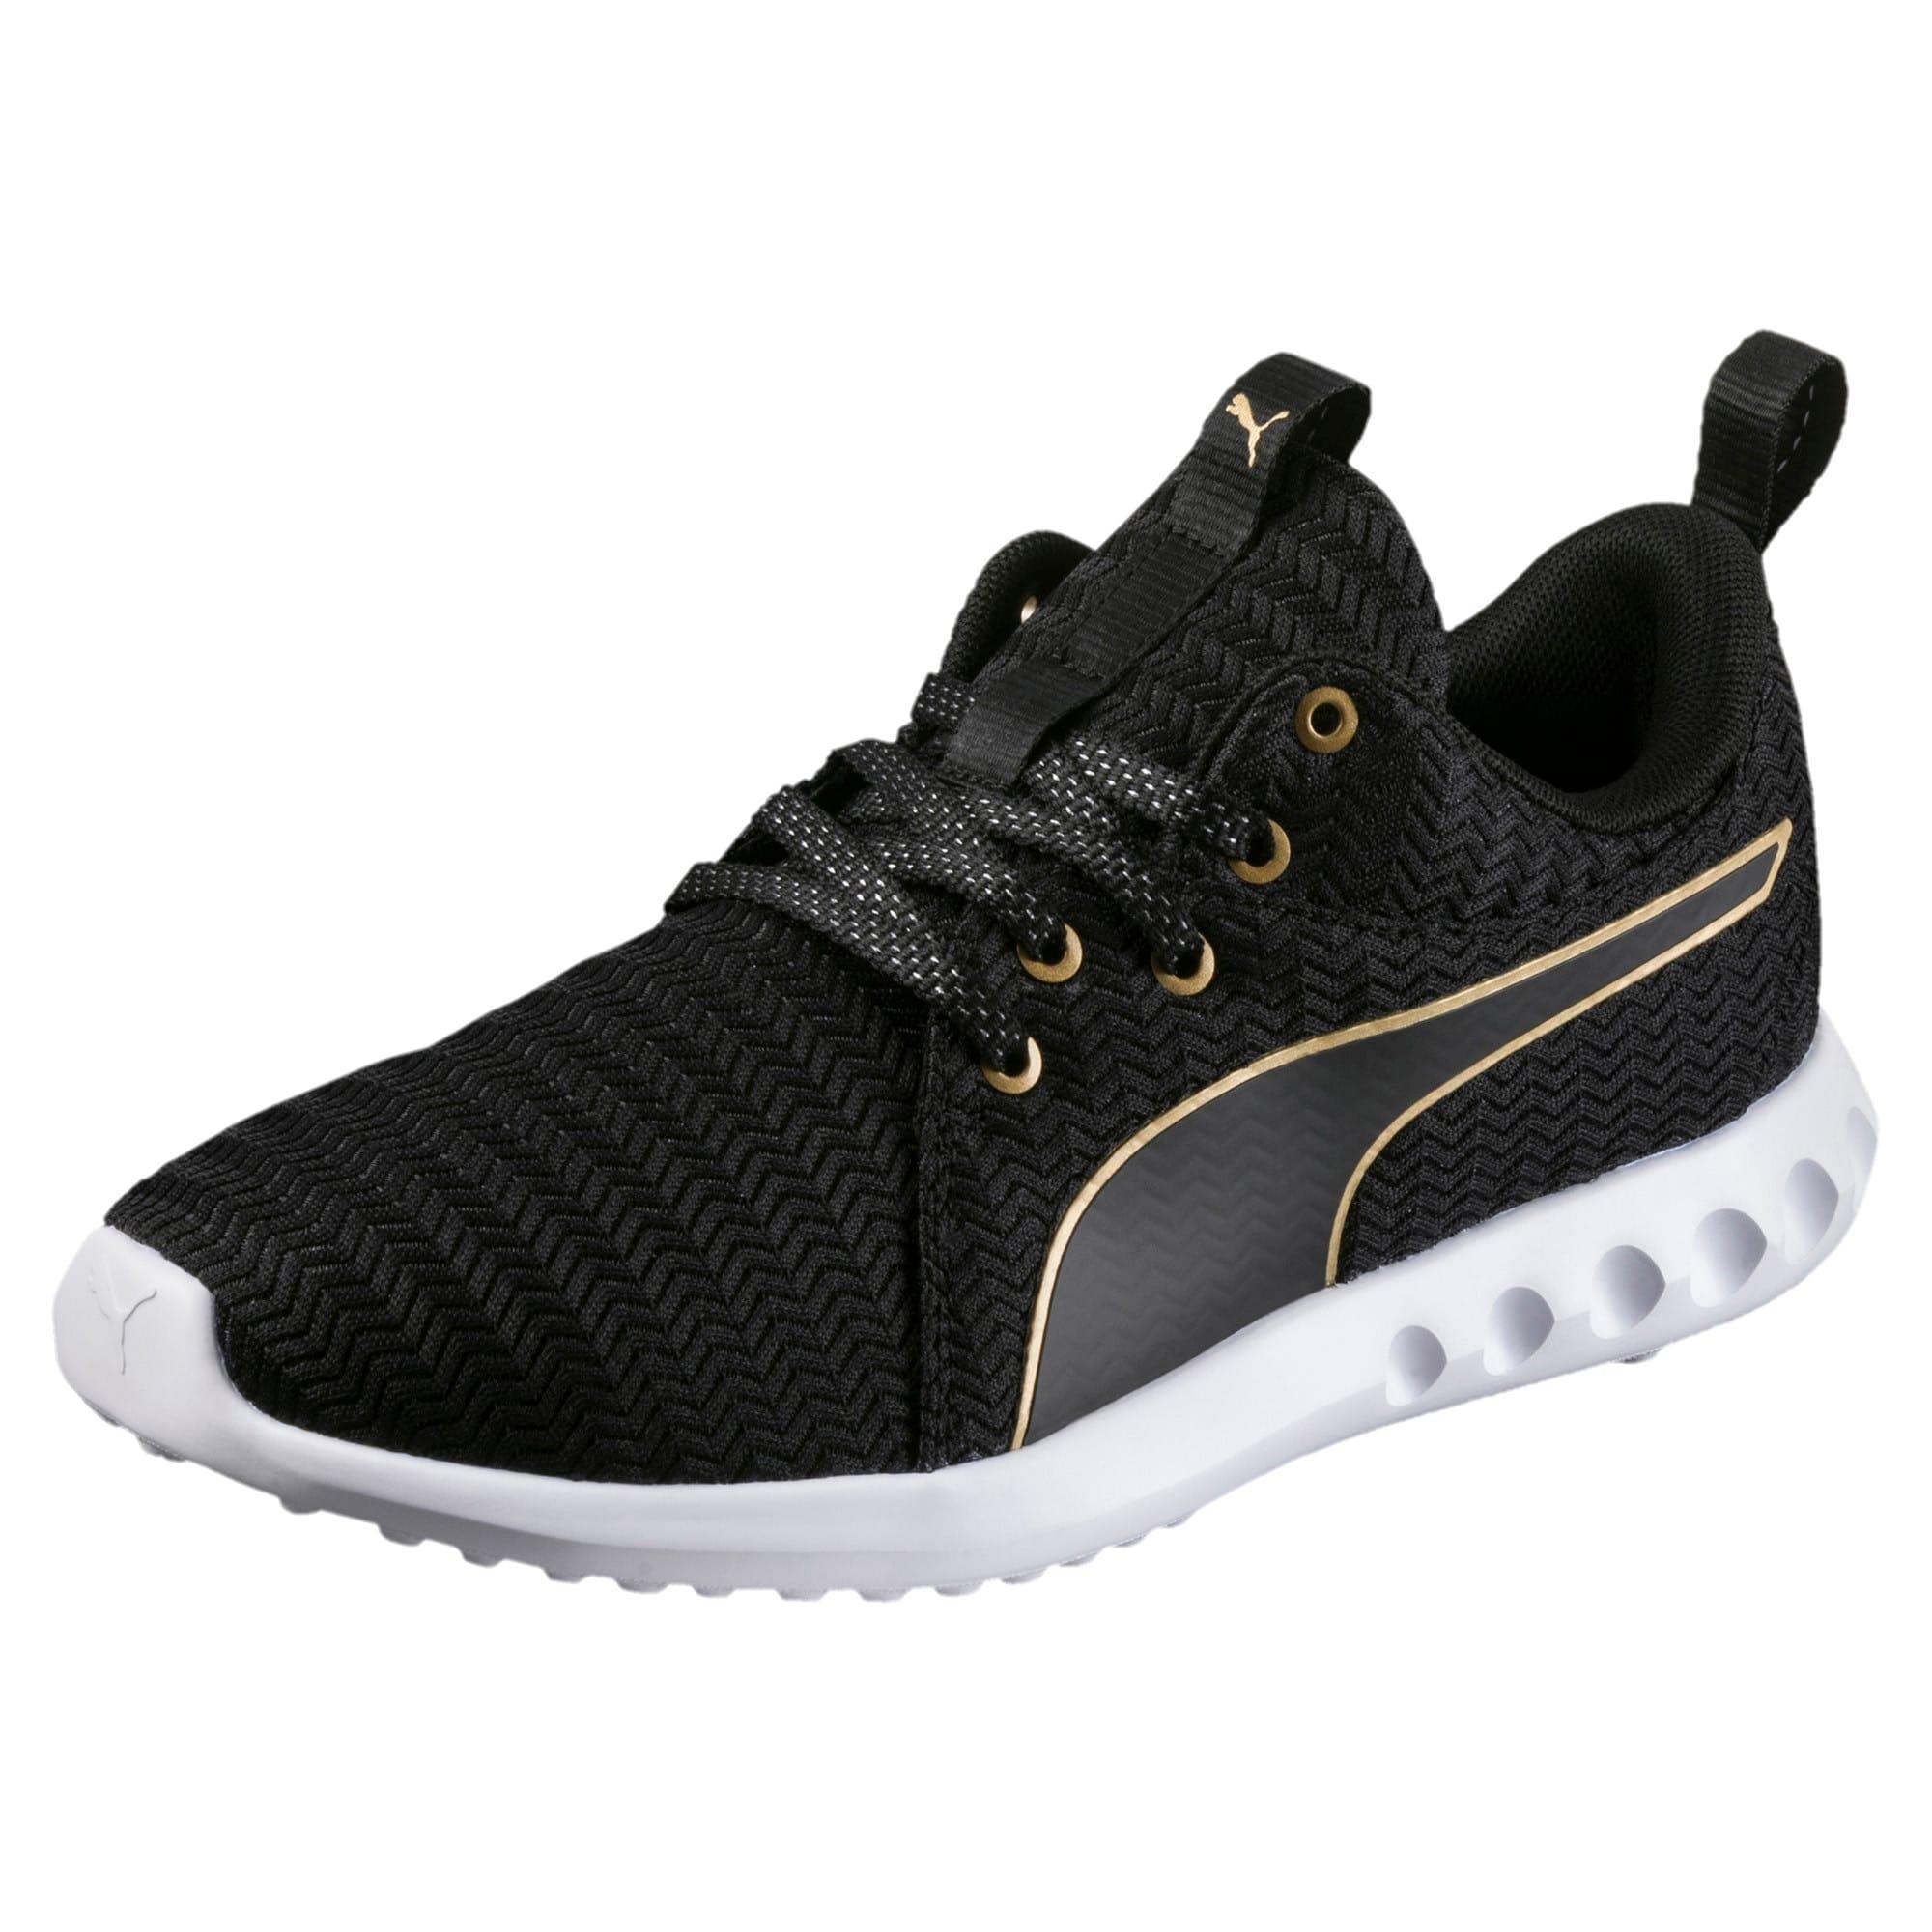 Thumbnail 1 of Carson 2 Metallic Women's Running Shoes, Puma Black-Gold, medium